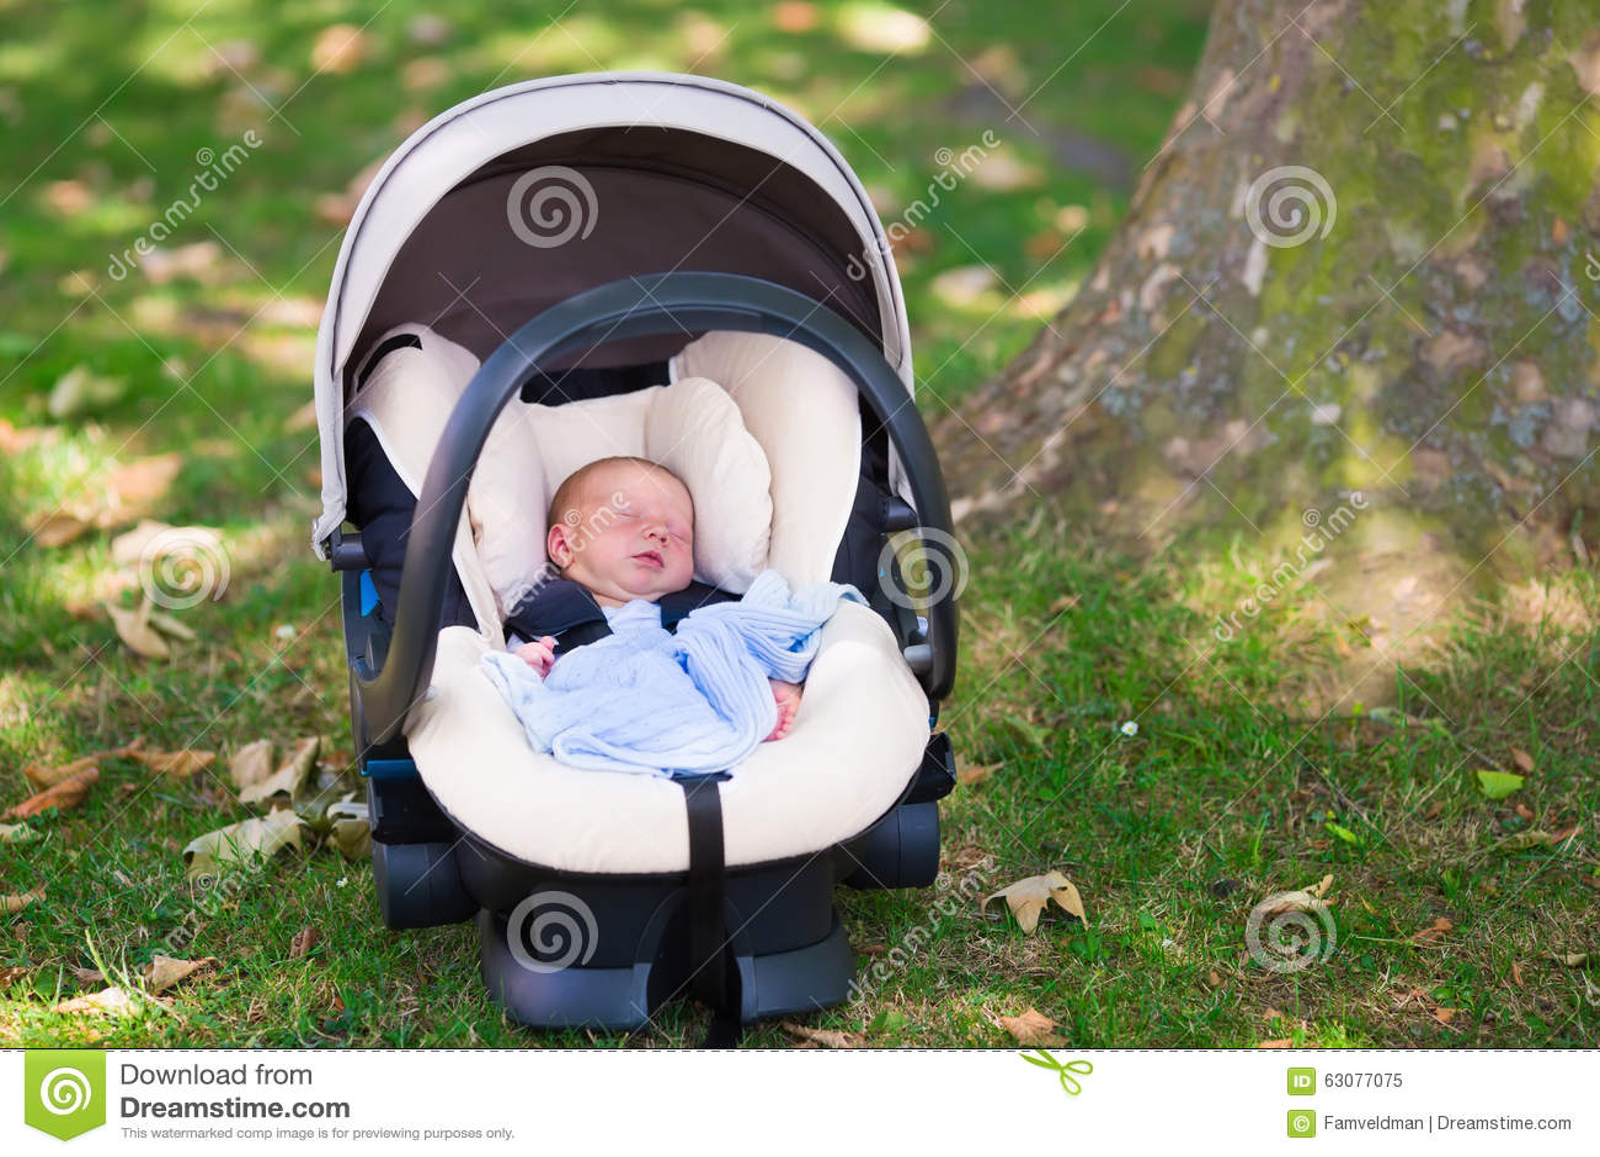 Infant Sleeping In Car Seat